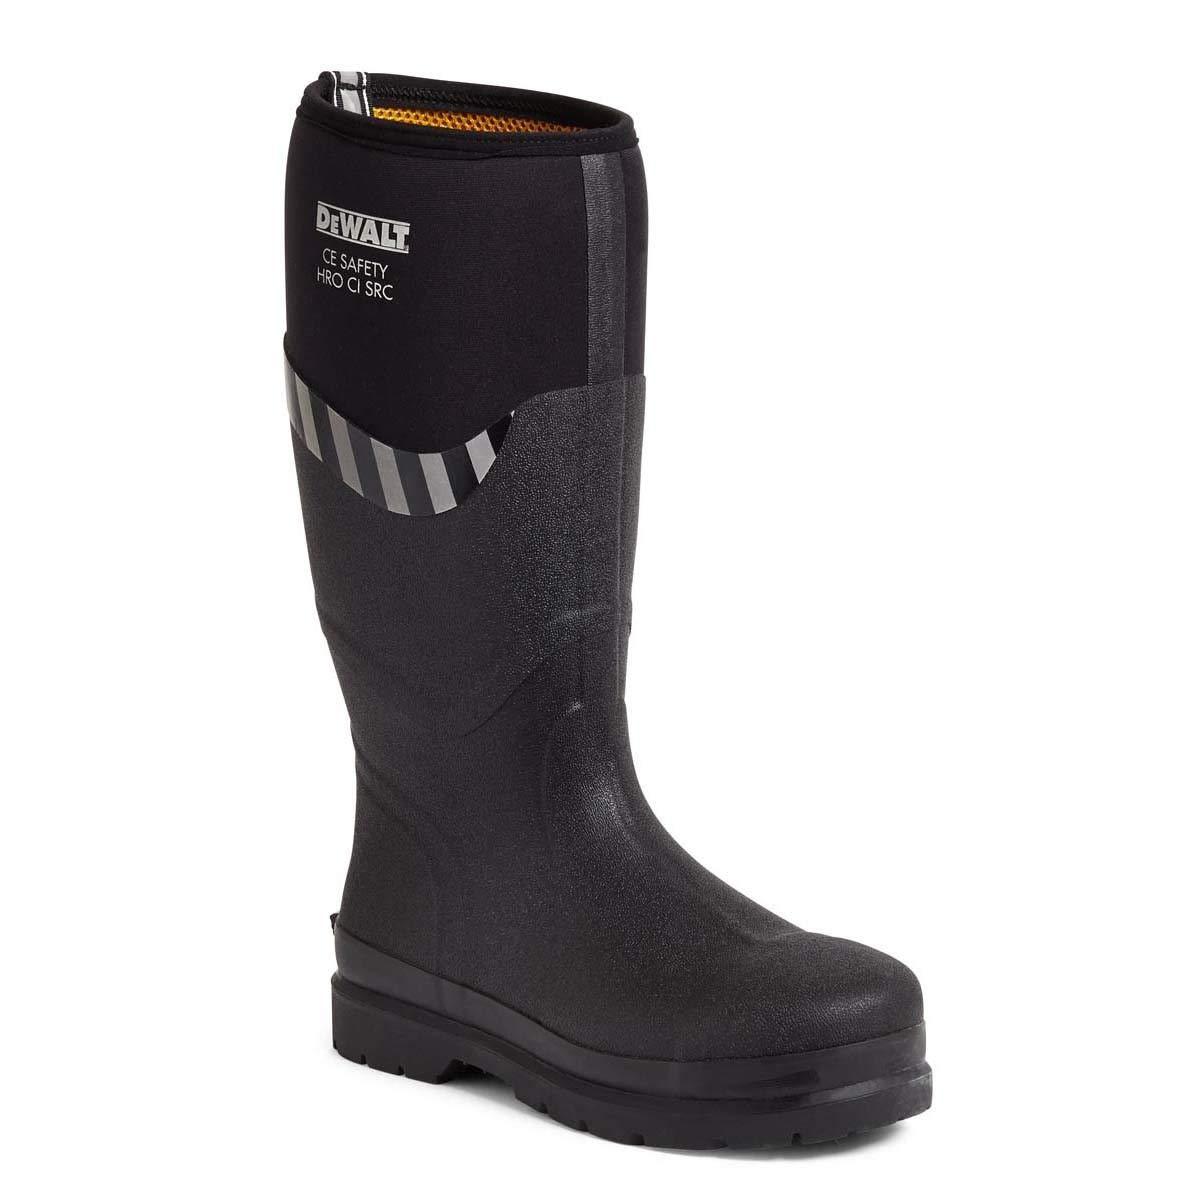 DEWALT Edmonston Mens Neoprene Safety Steel Toe SBP Wellie Boots